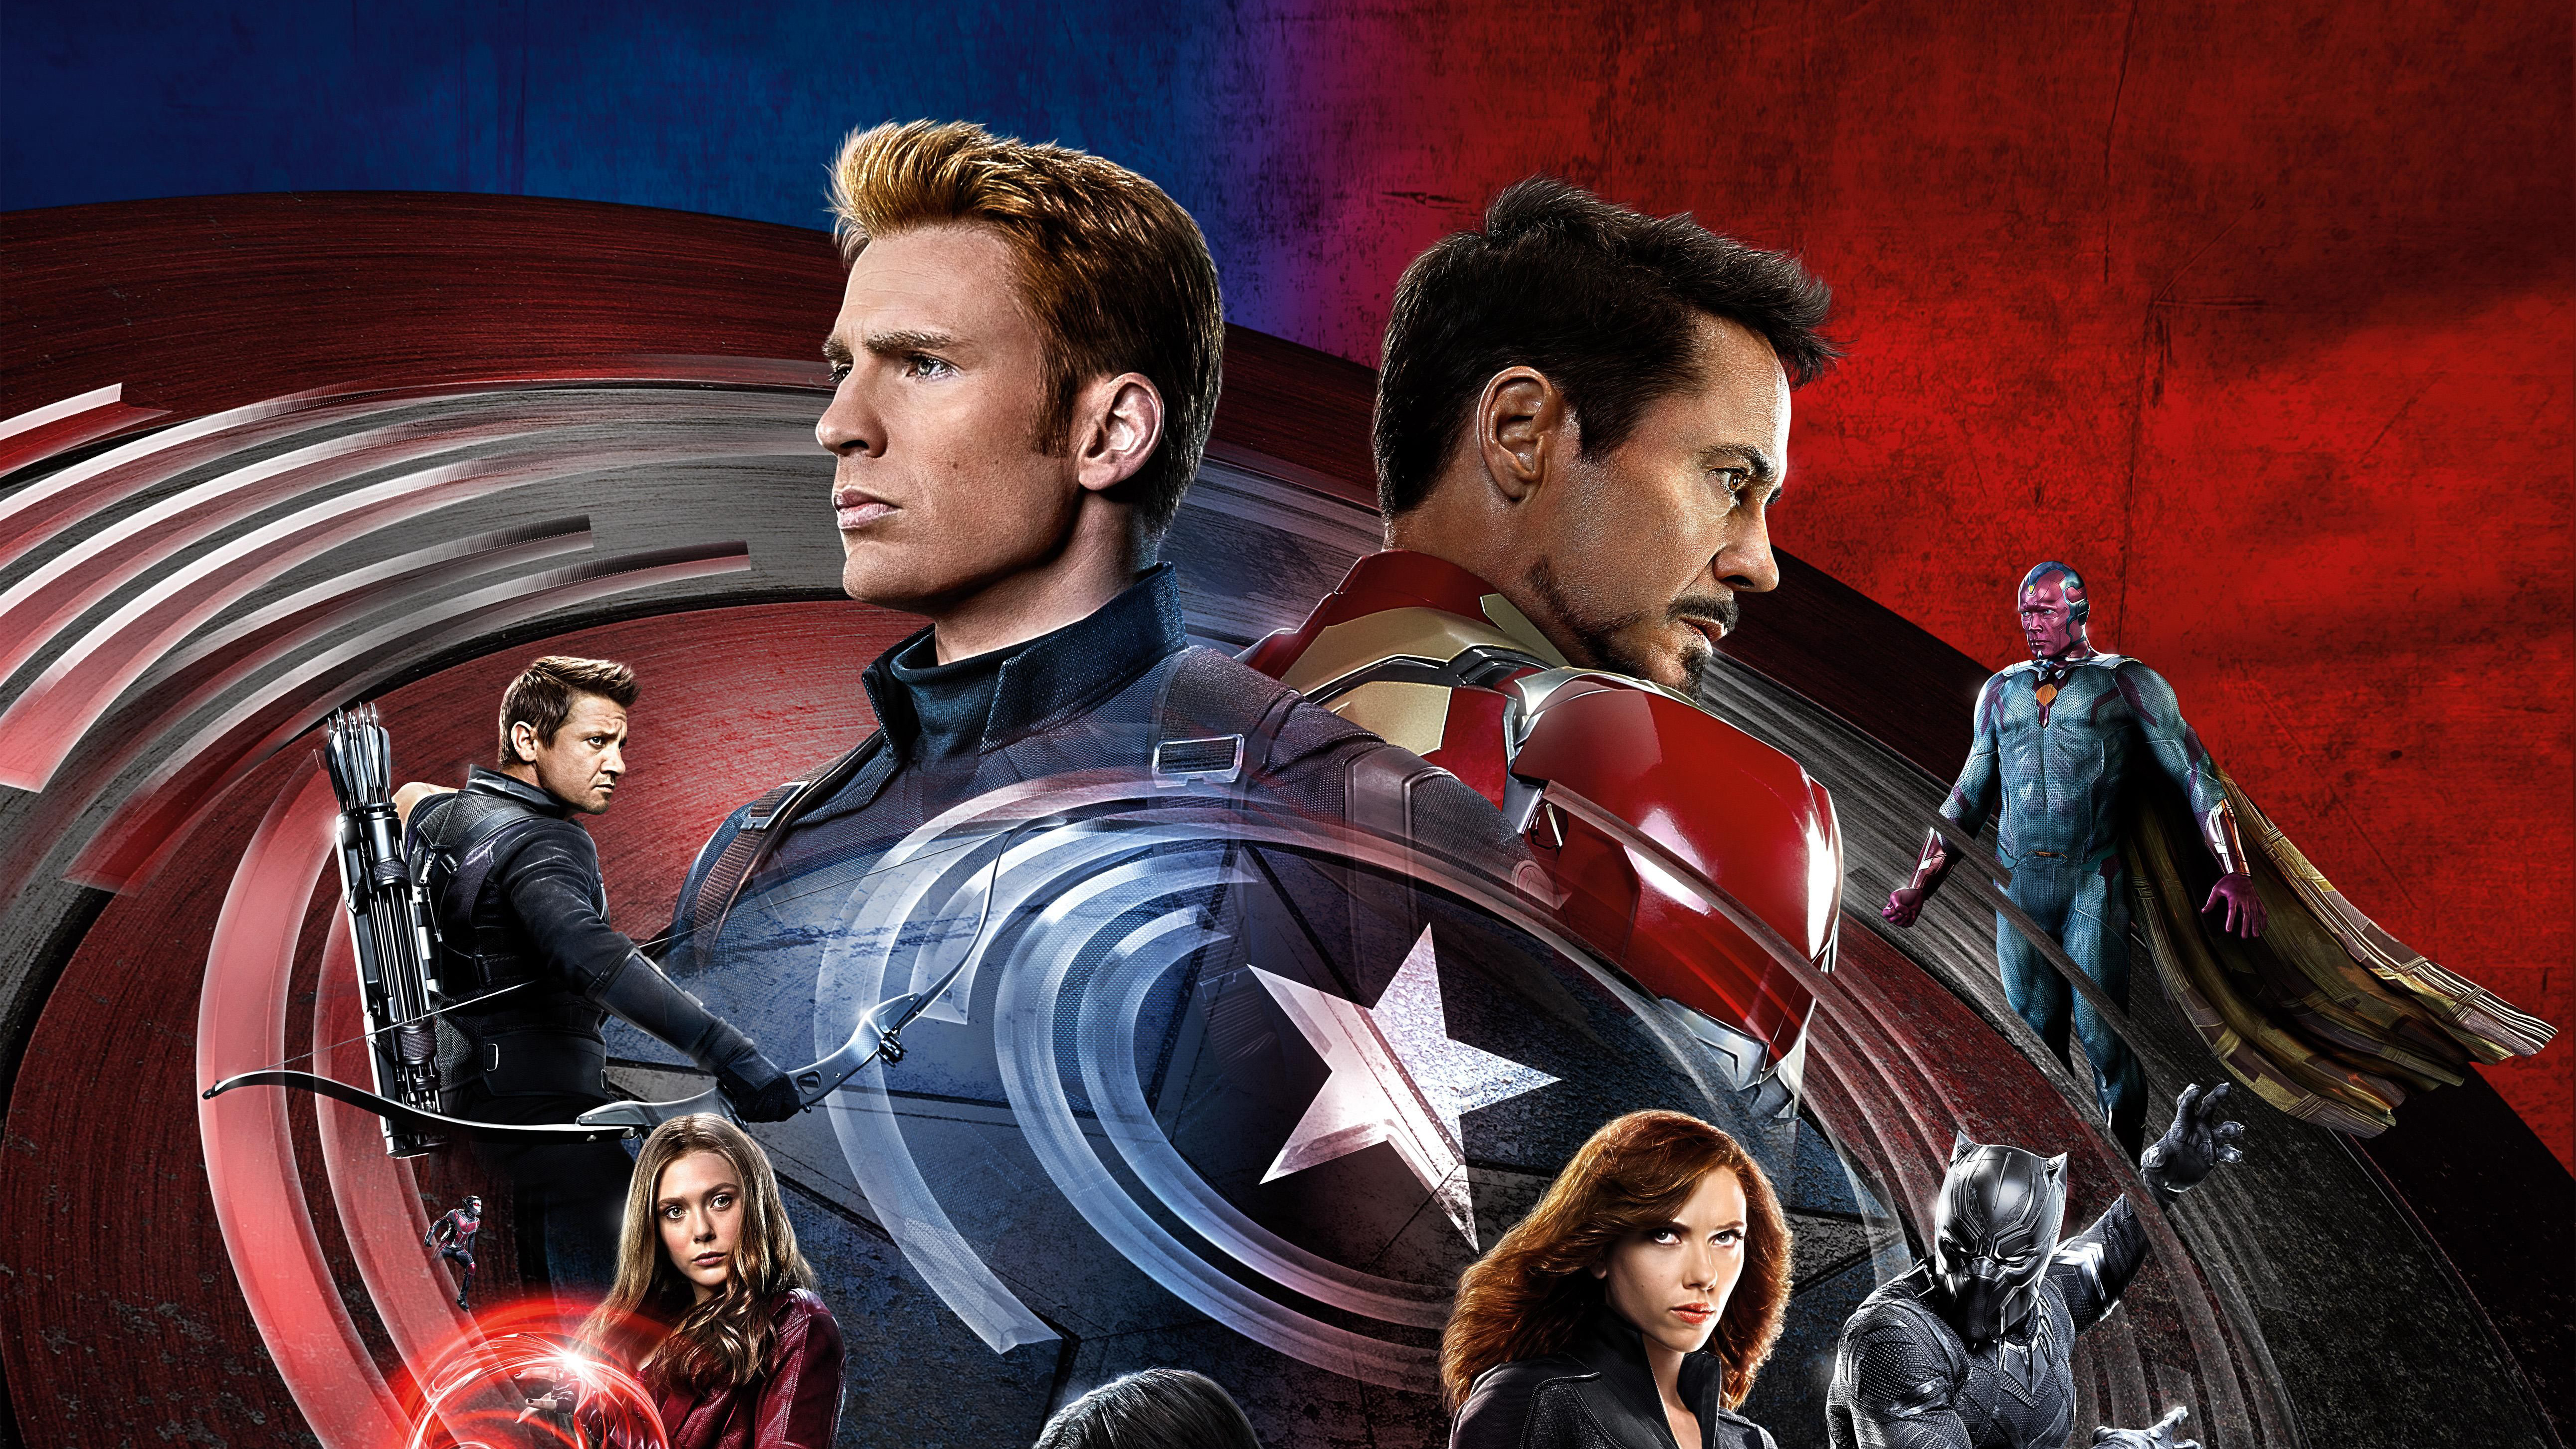 2560x1440 Captain America Civil War 4k 1440P Resolution HD ...